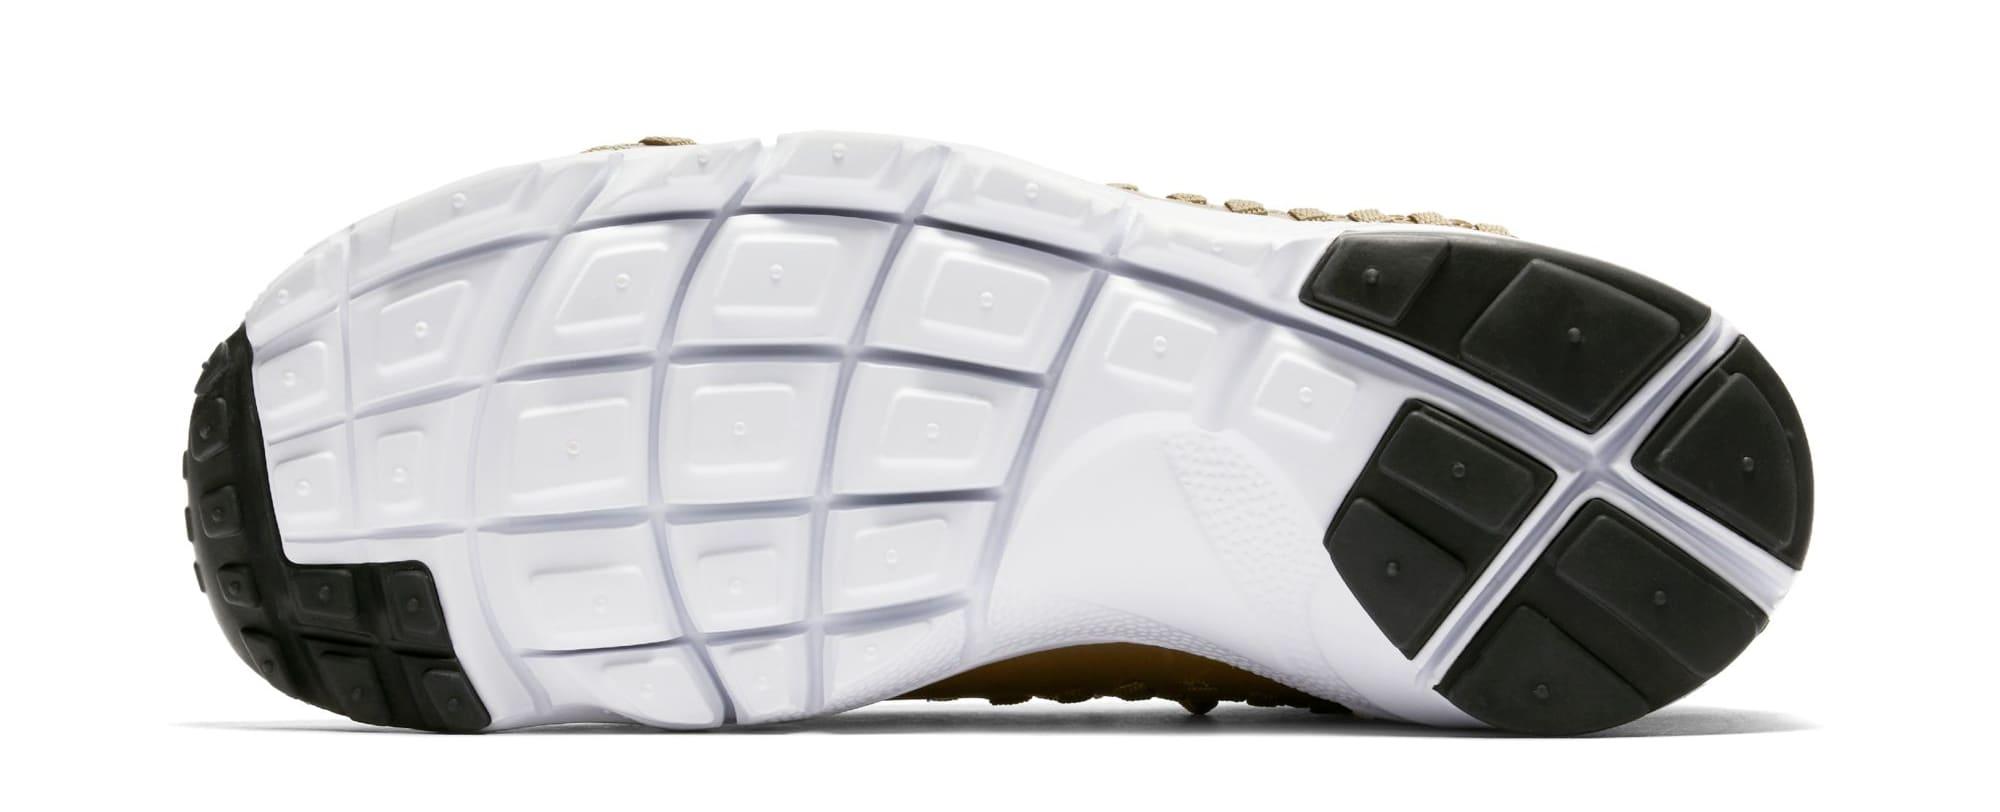 Nike Footscape Woven Chukka Flyknit 'Golden Beige' AO5417-400 (Sole)